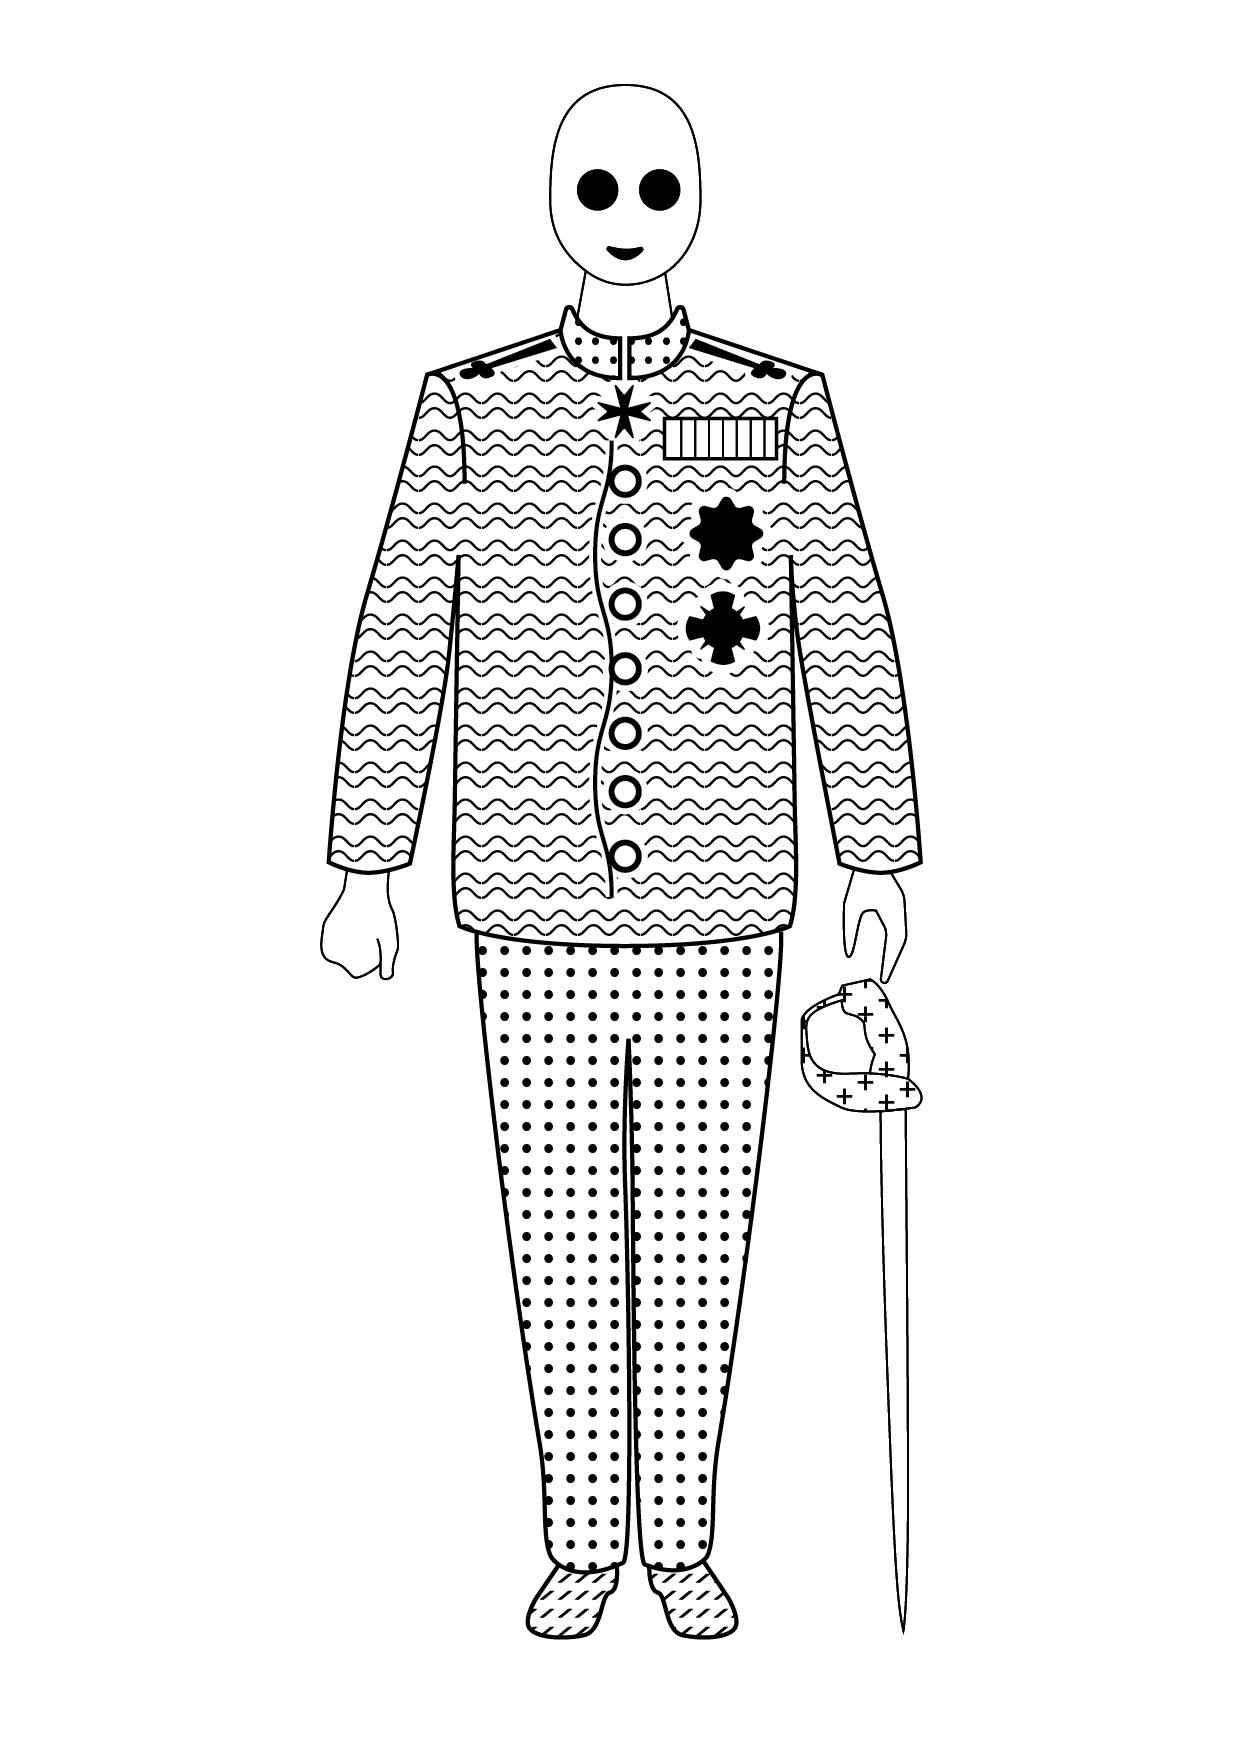 king carol's uniform